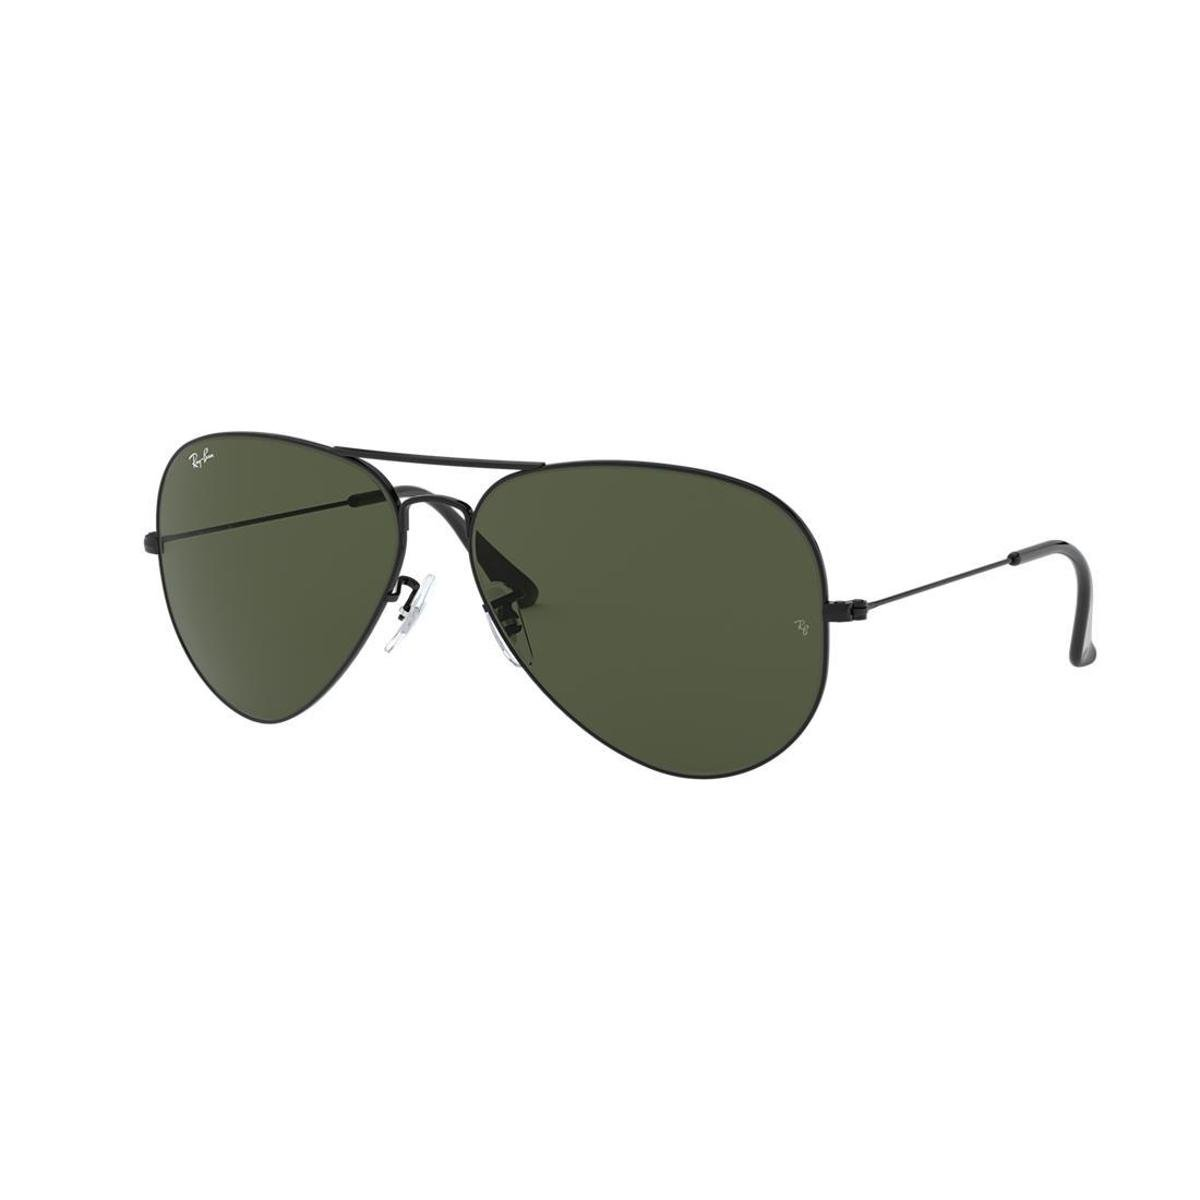 Óculos de Sol Ray-Ban RB3026 Aviator Large Metal II - Compre Agora ... 9922d98413